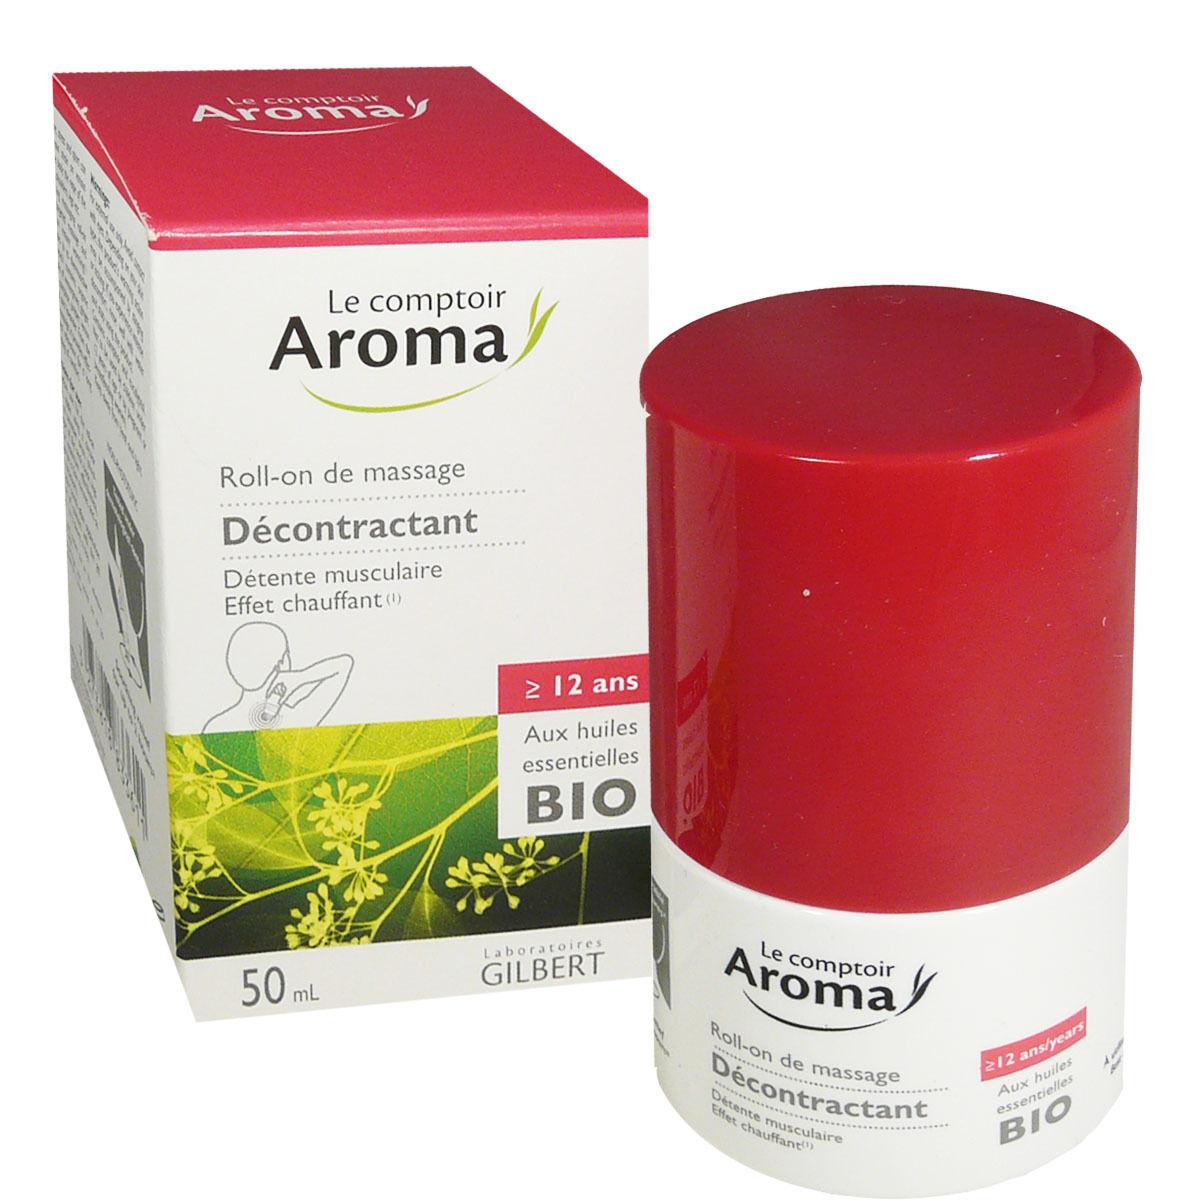 LE COMPTOIR AROMA Aroma decontractant roll on bio 50 ml huiles essentielles